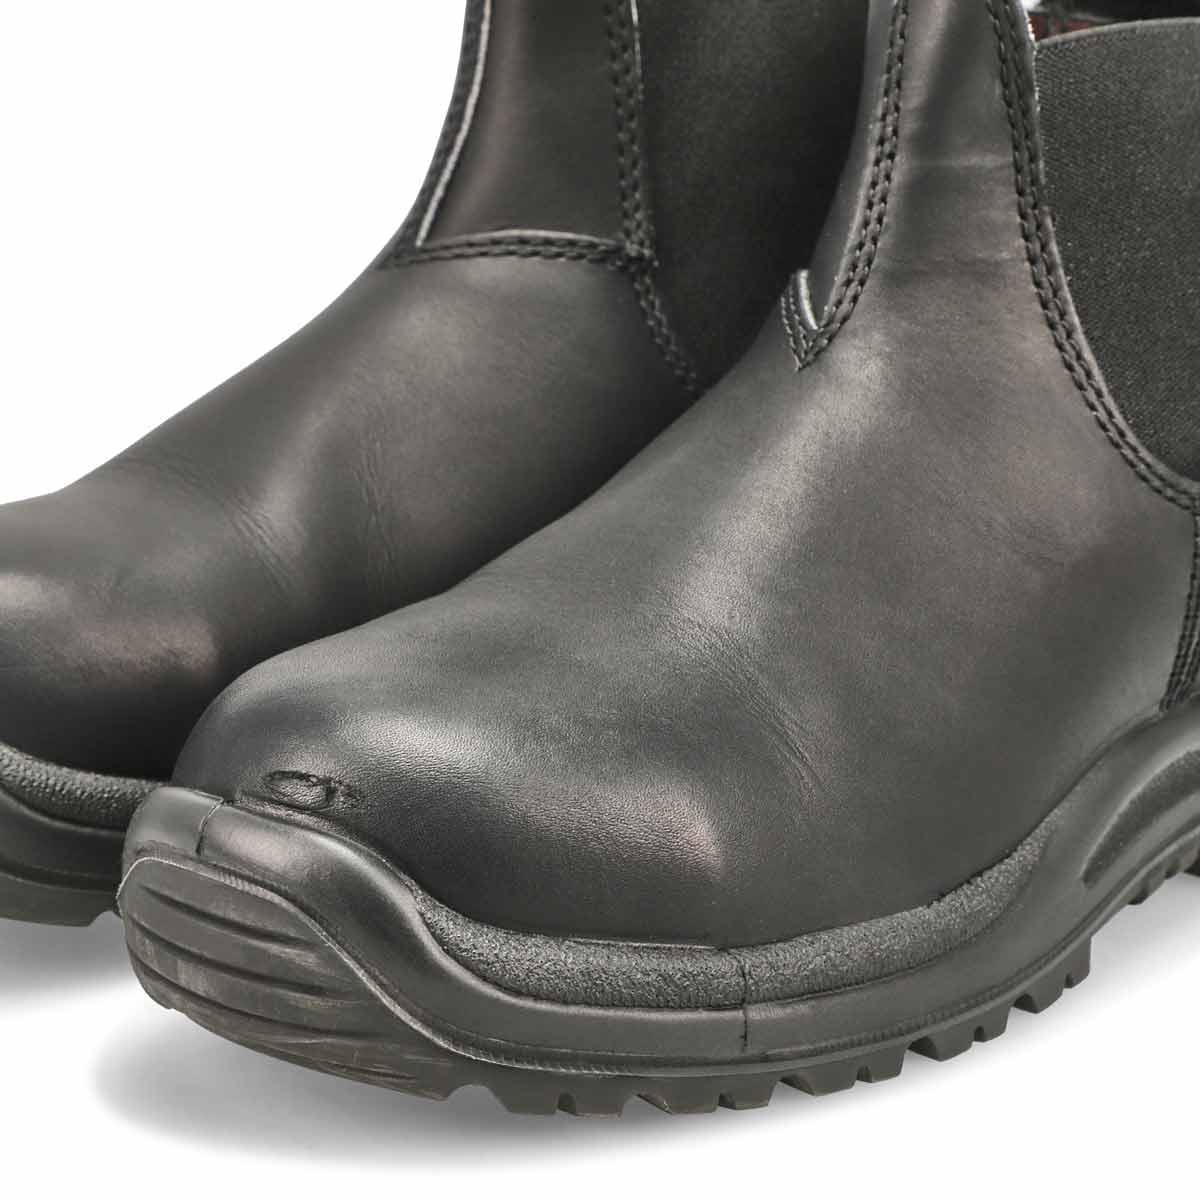 Unisex CSA black twin gore boot